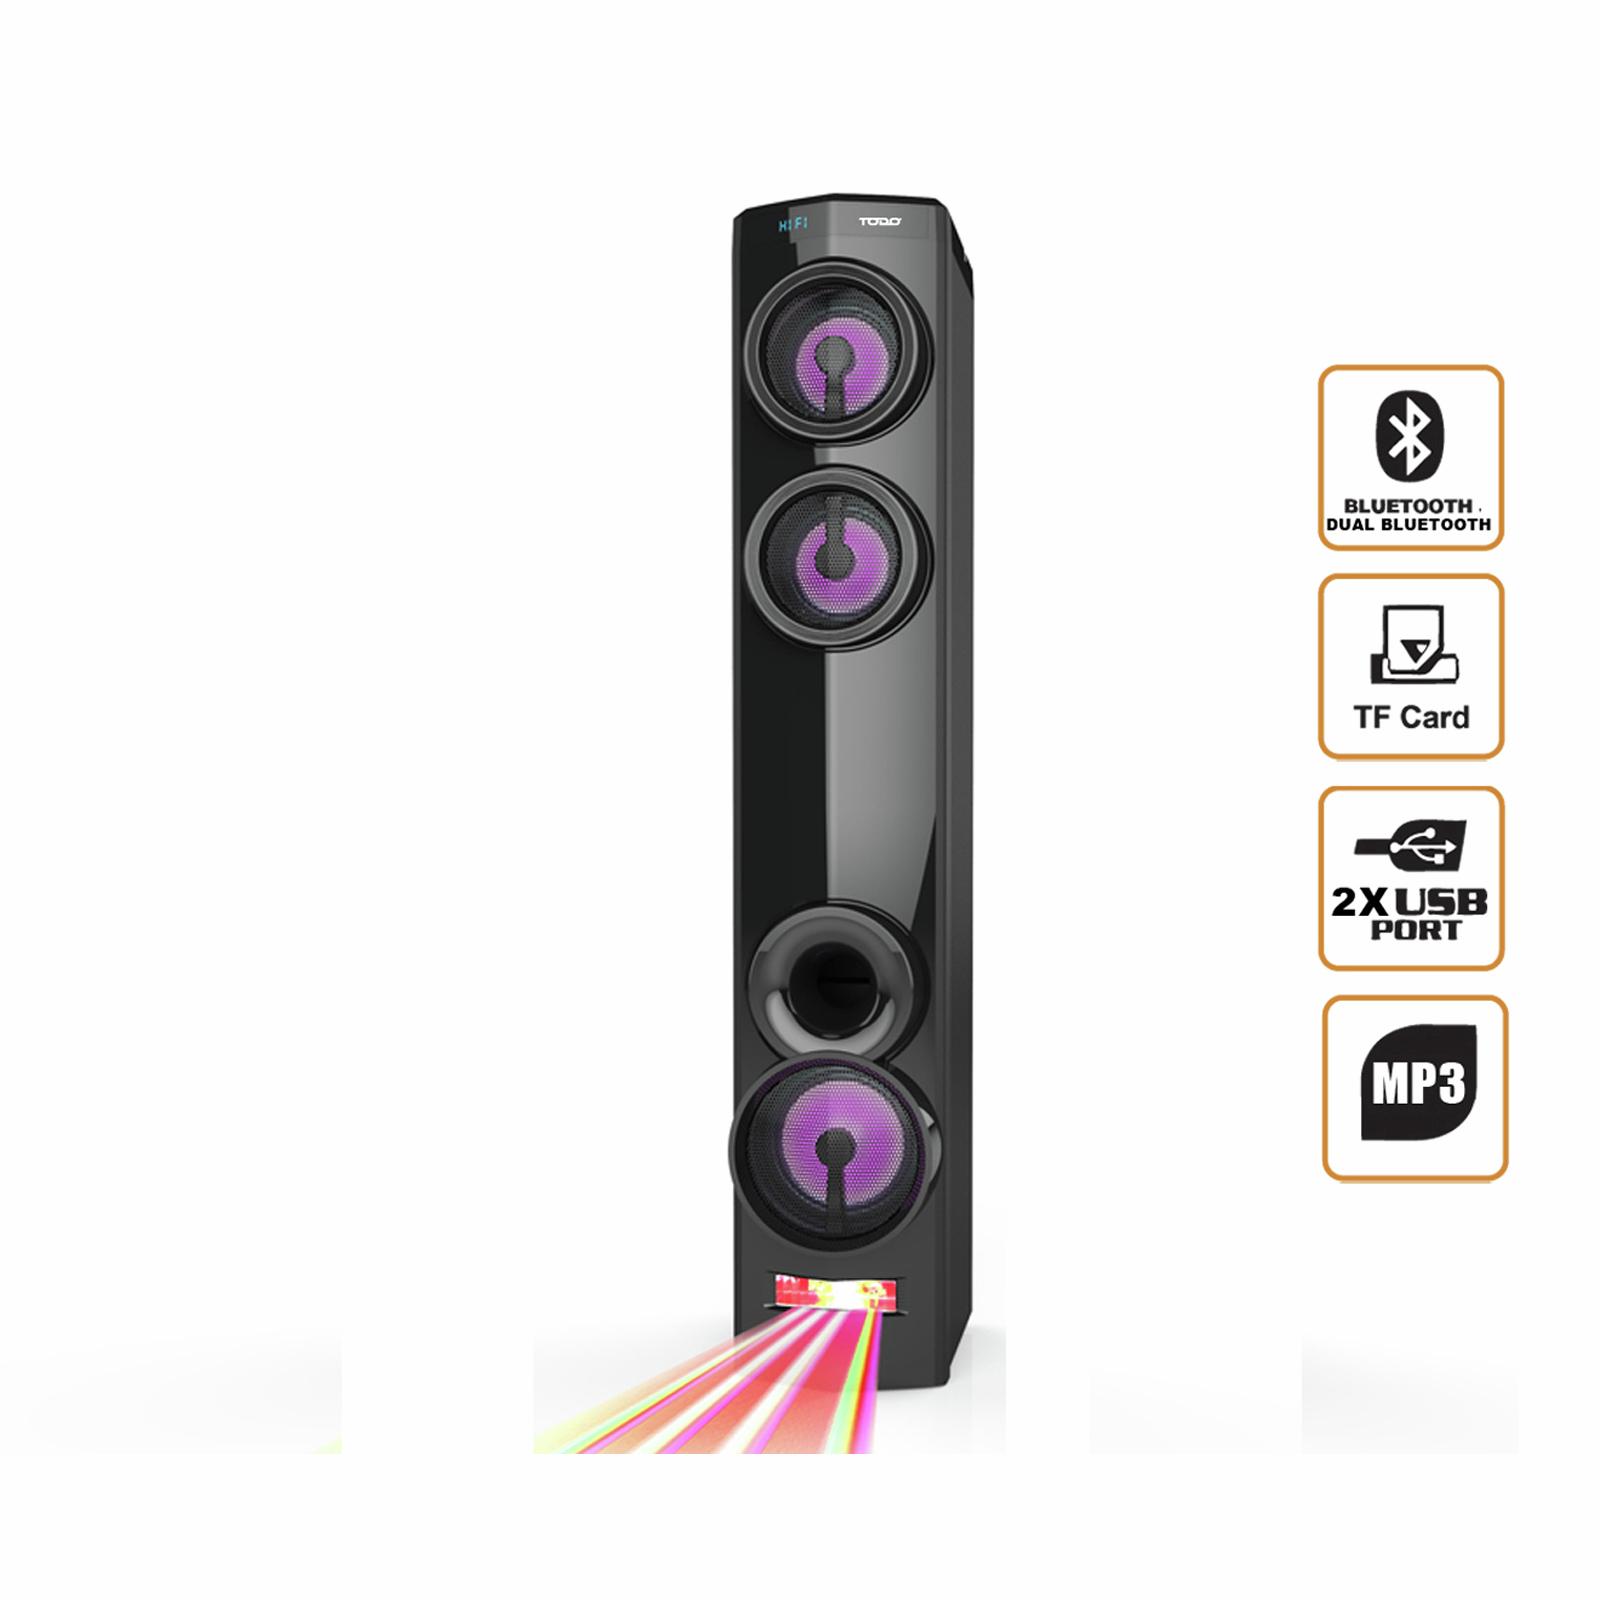 TODO Bluetooth Tower Speaker w/ Dual Bluetooth USB DJ Light Mode